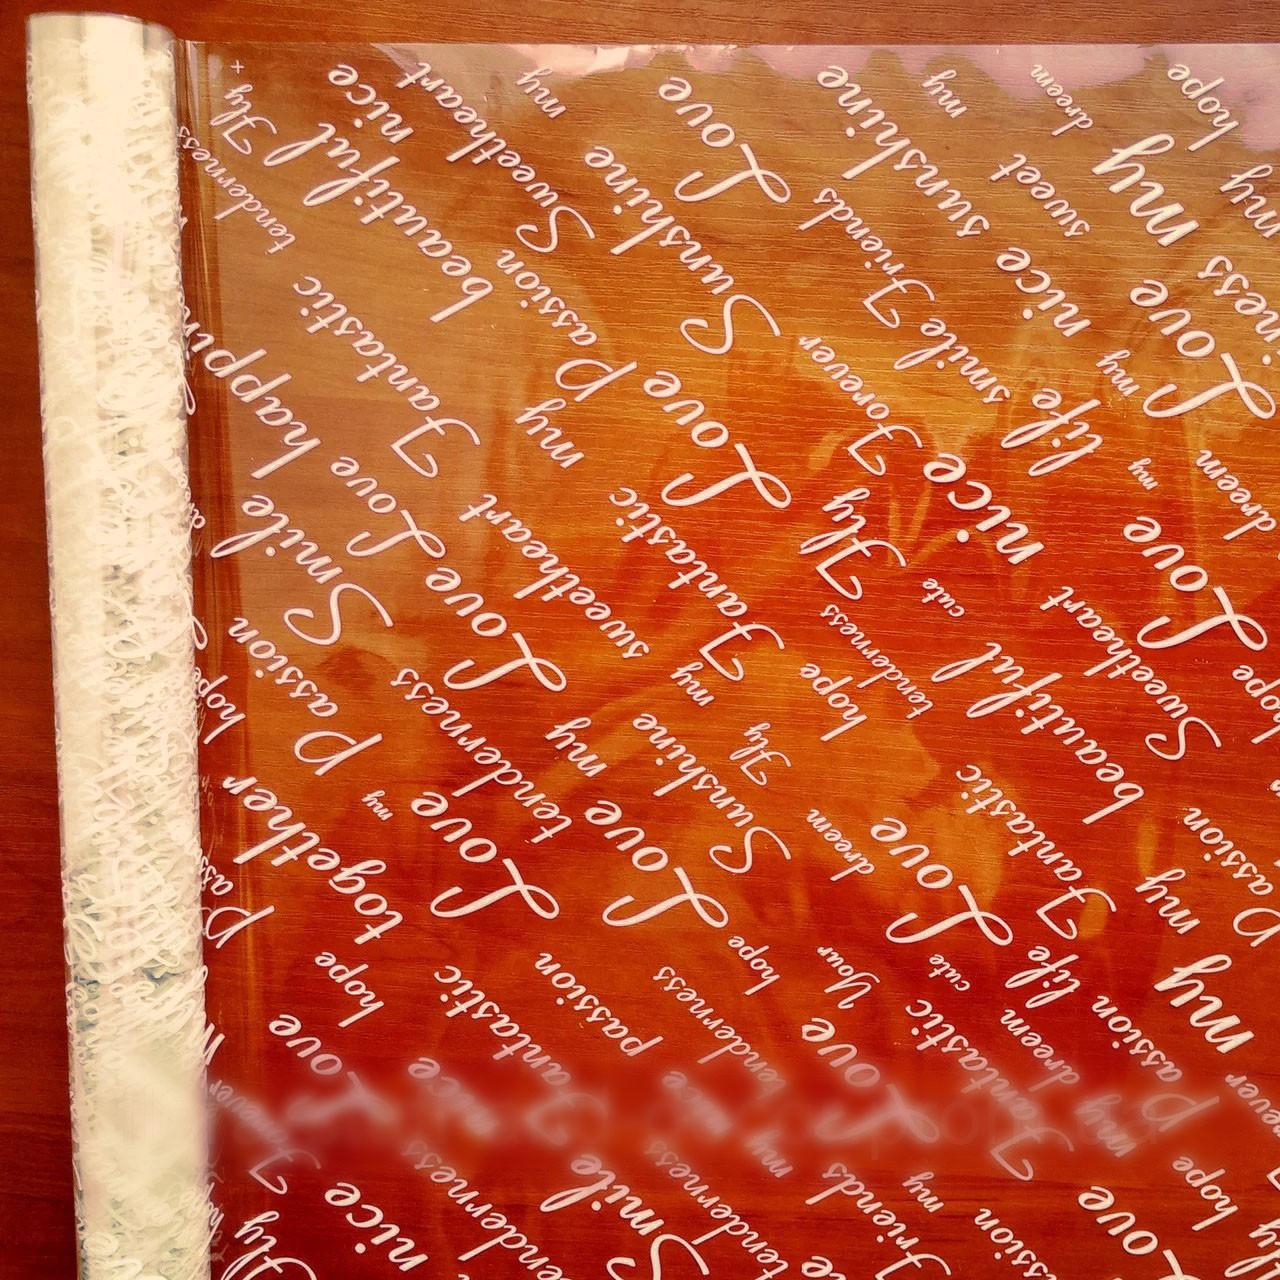 Пленка прозрачная Love кремовая 400 гр 60 см